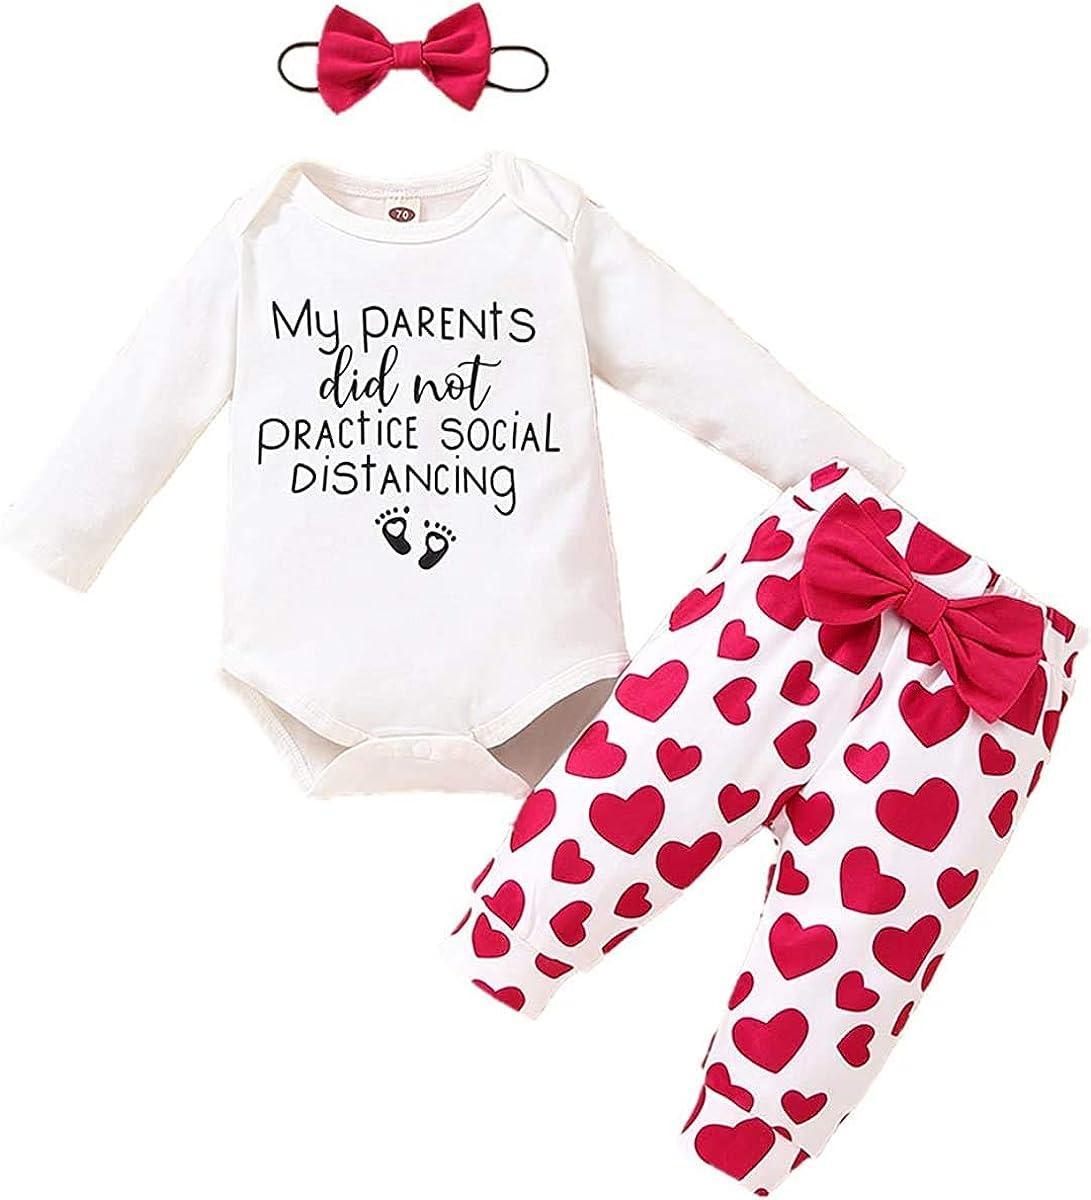 Newborn Baby Girls Boys Valentines' Day Outfits Hooded Sweatshirt Long Sleeve T-Shirt Top + Pants Set